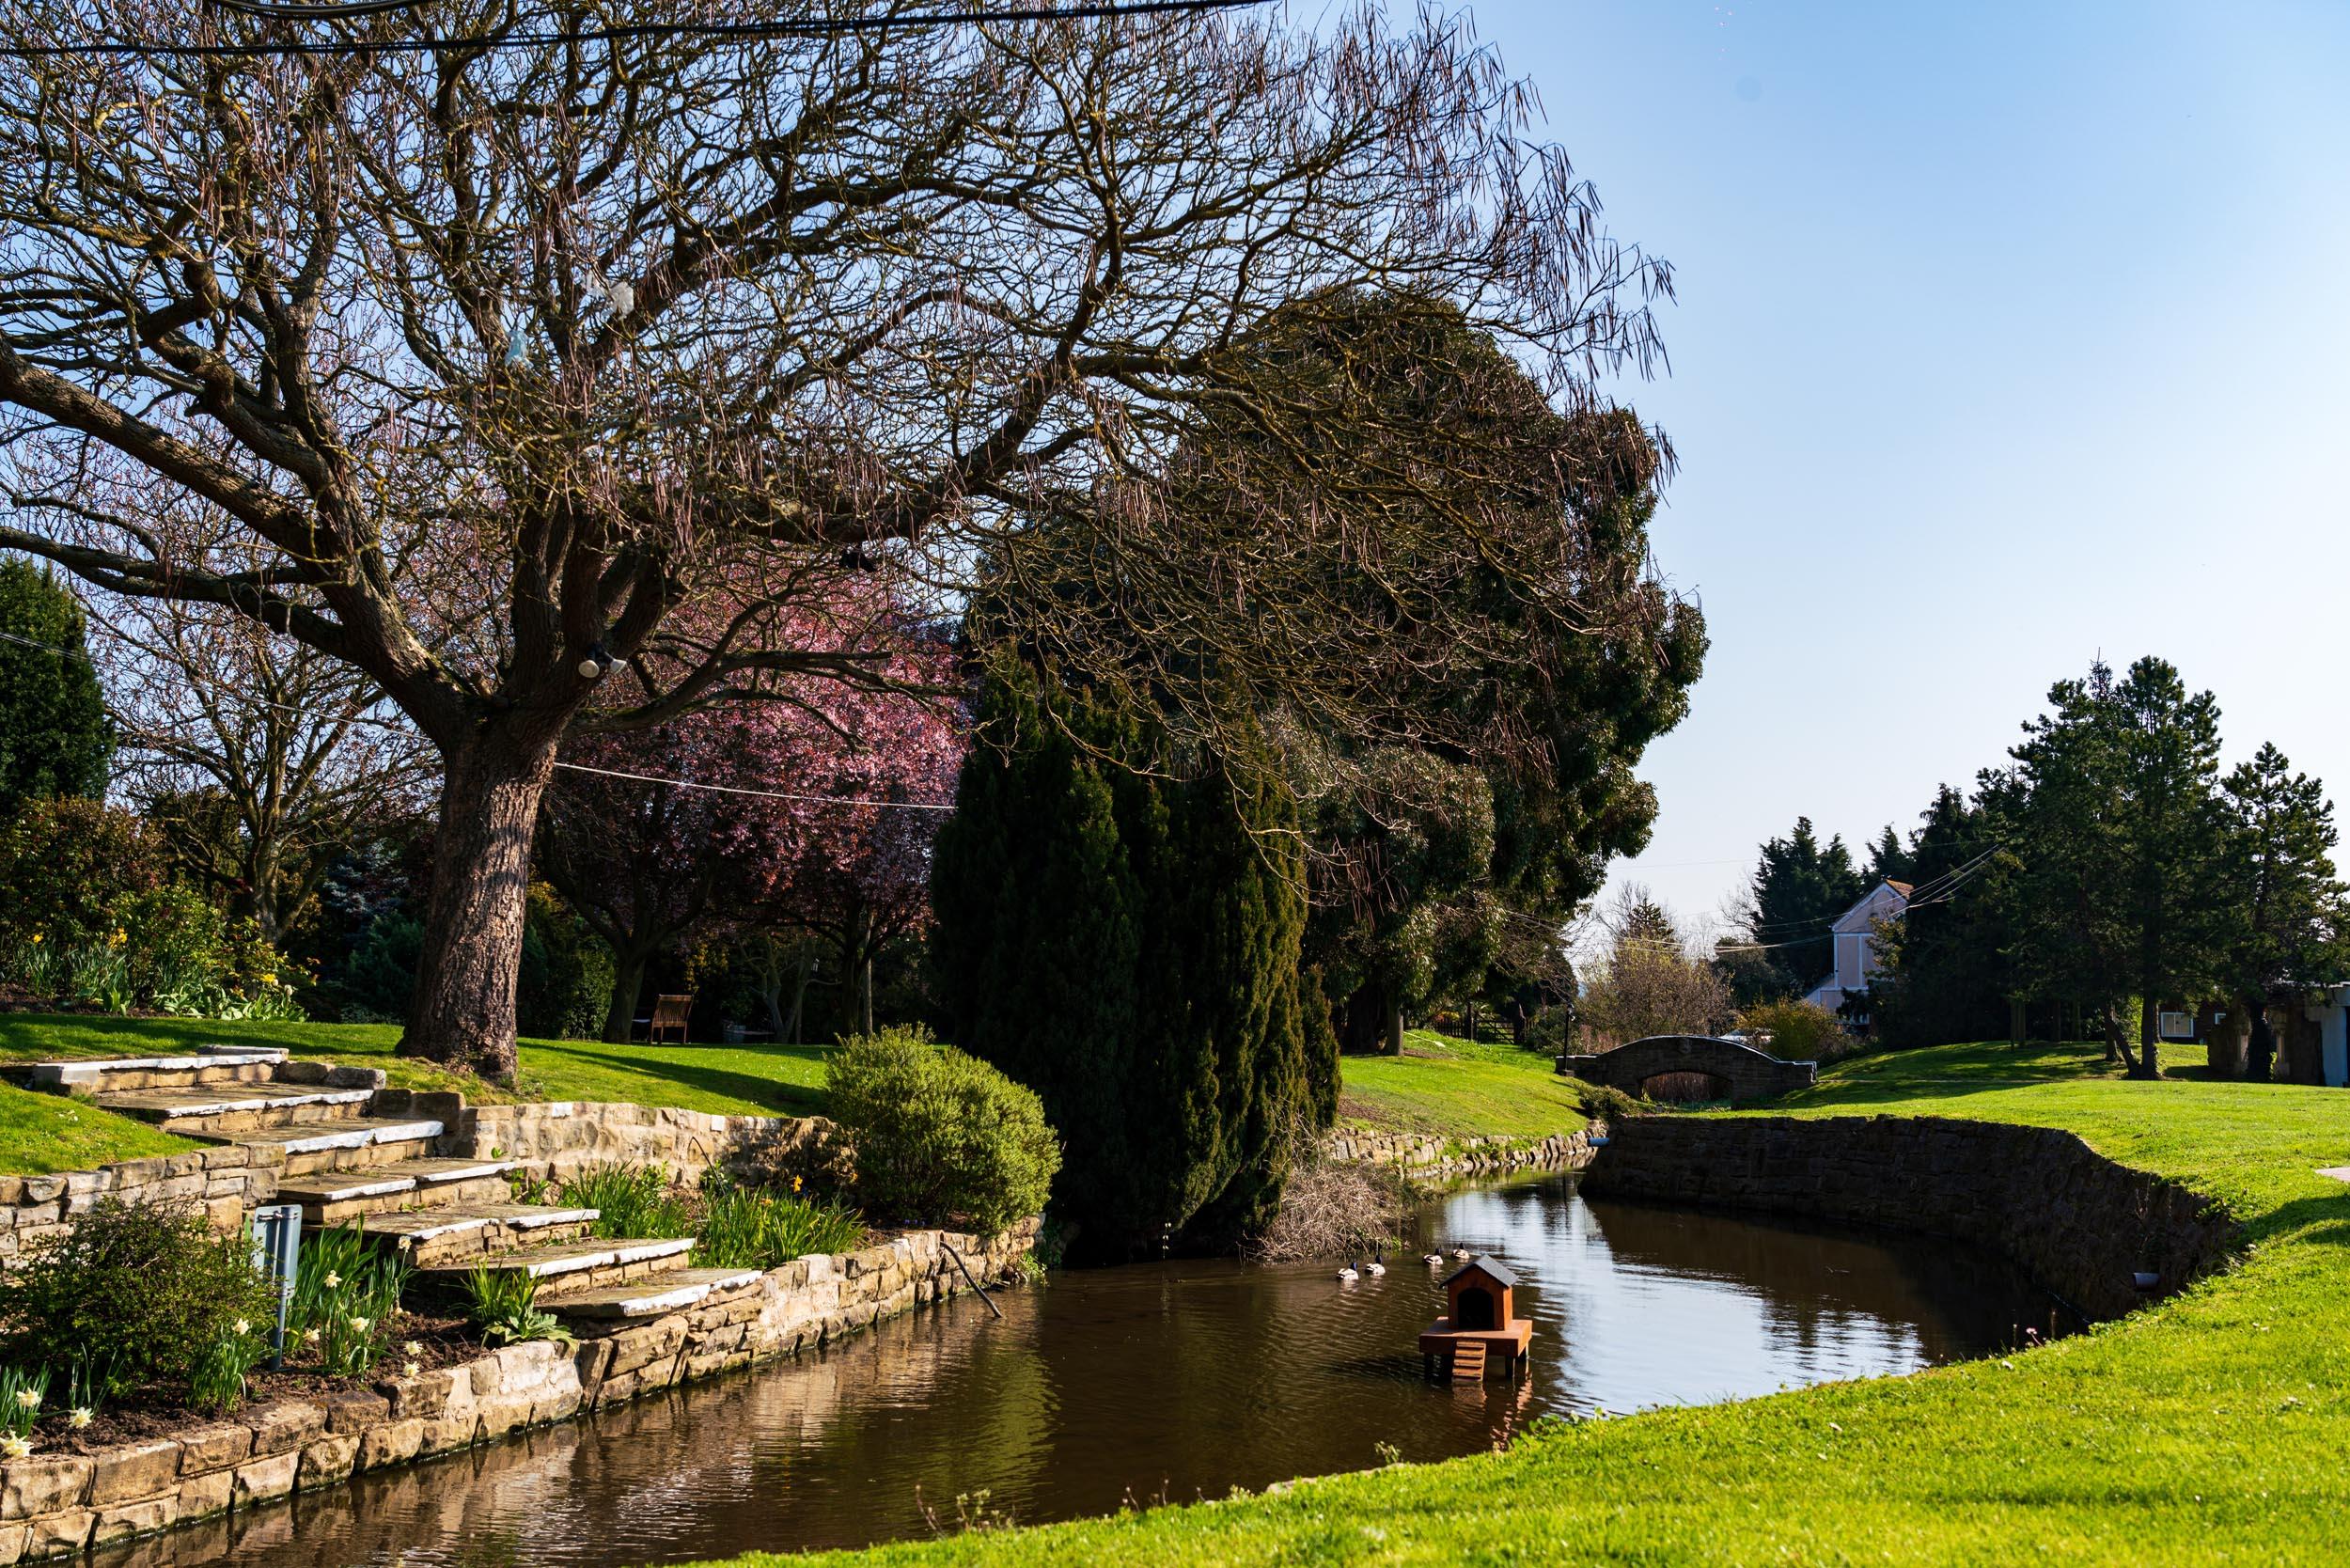 Ye Olde Plough House Stream and Bridge